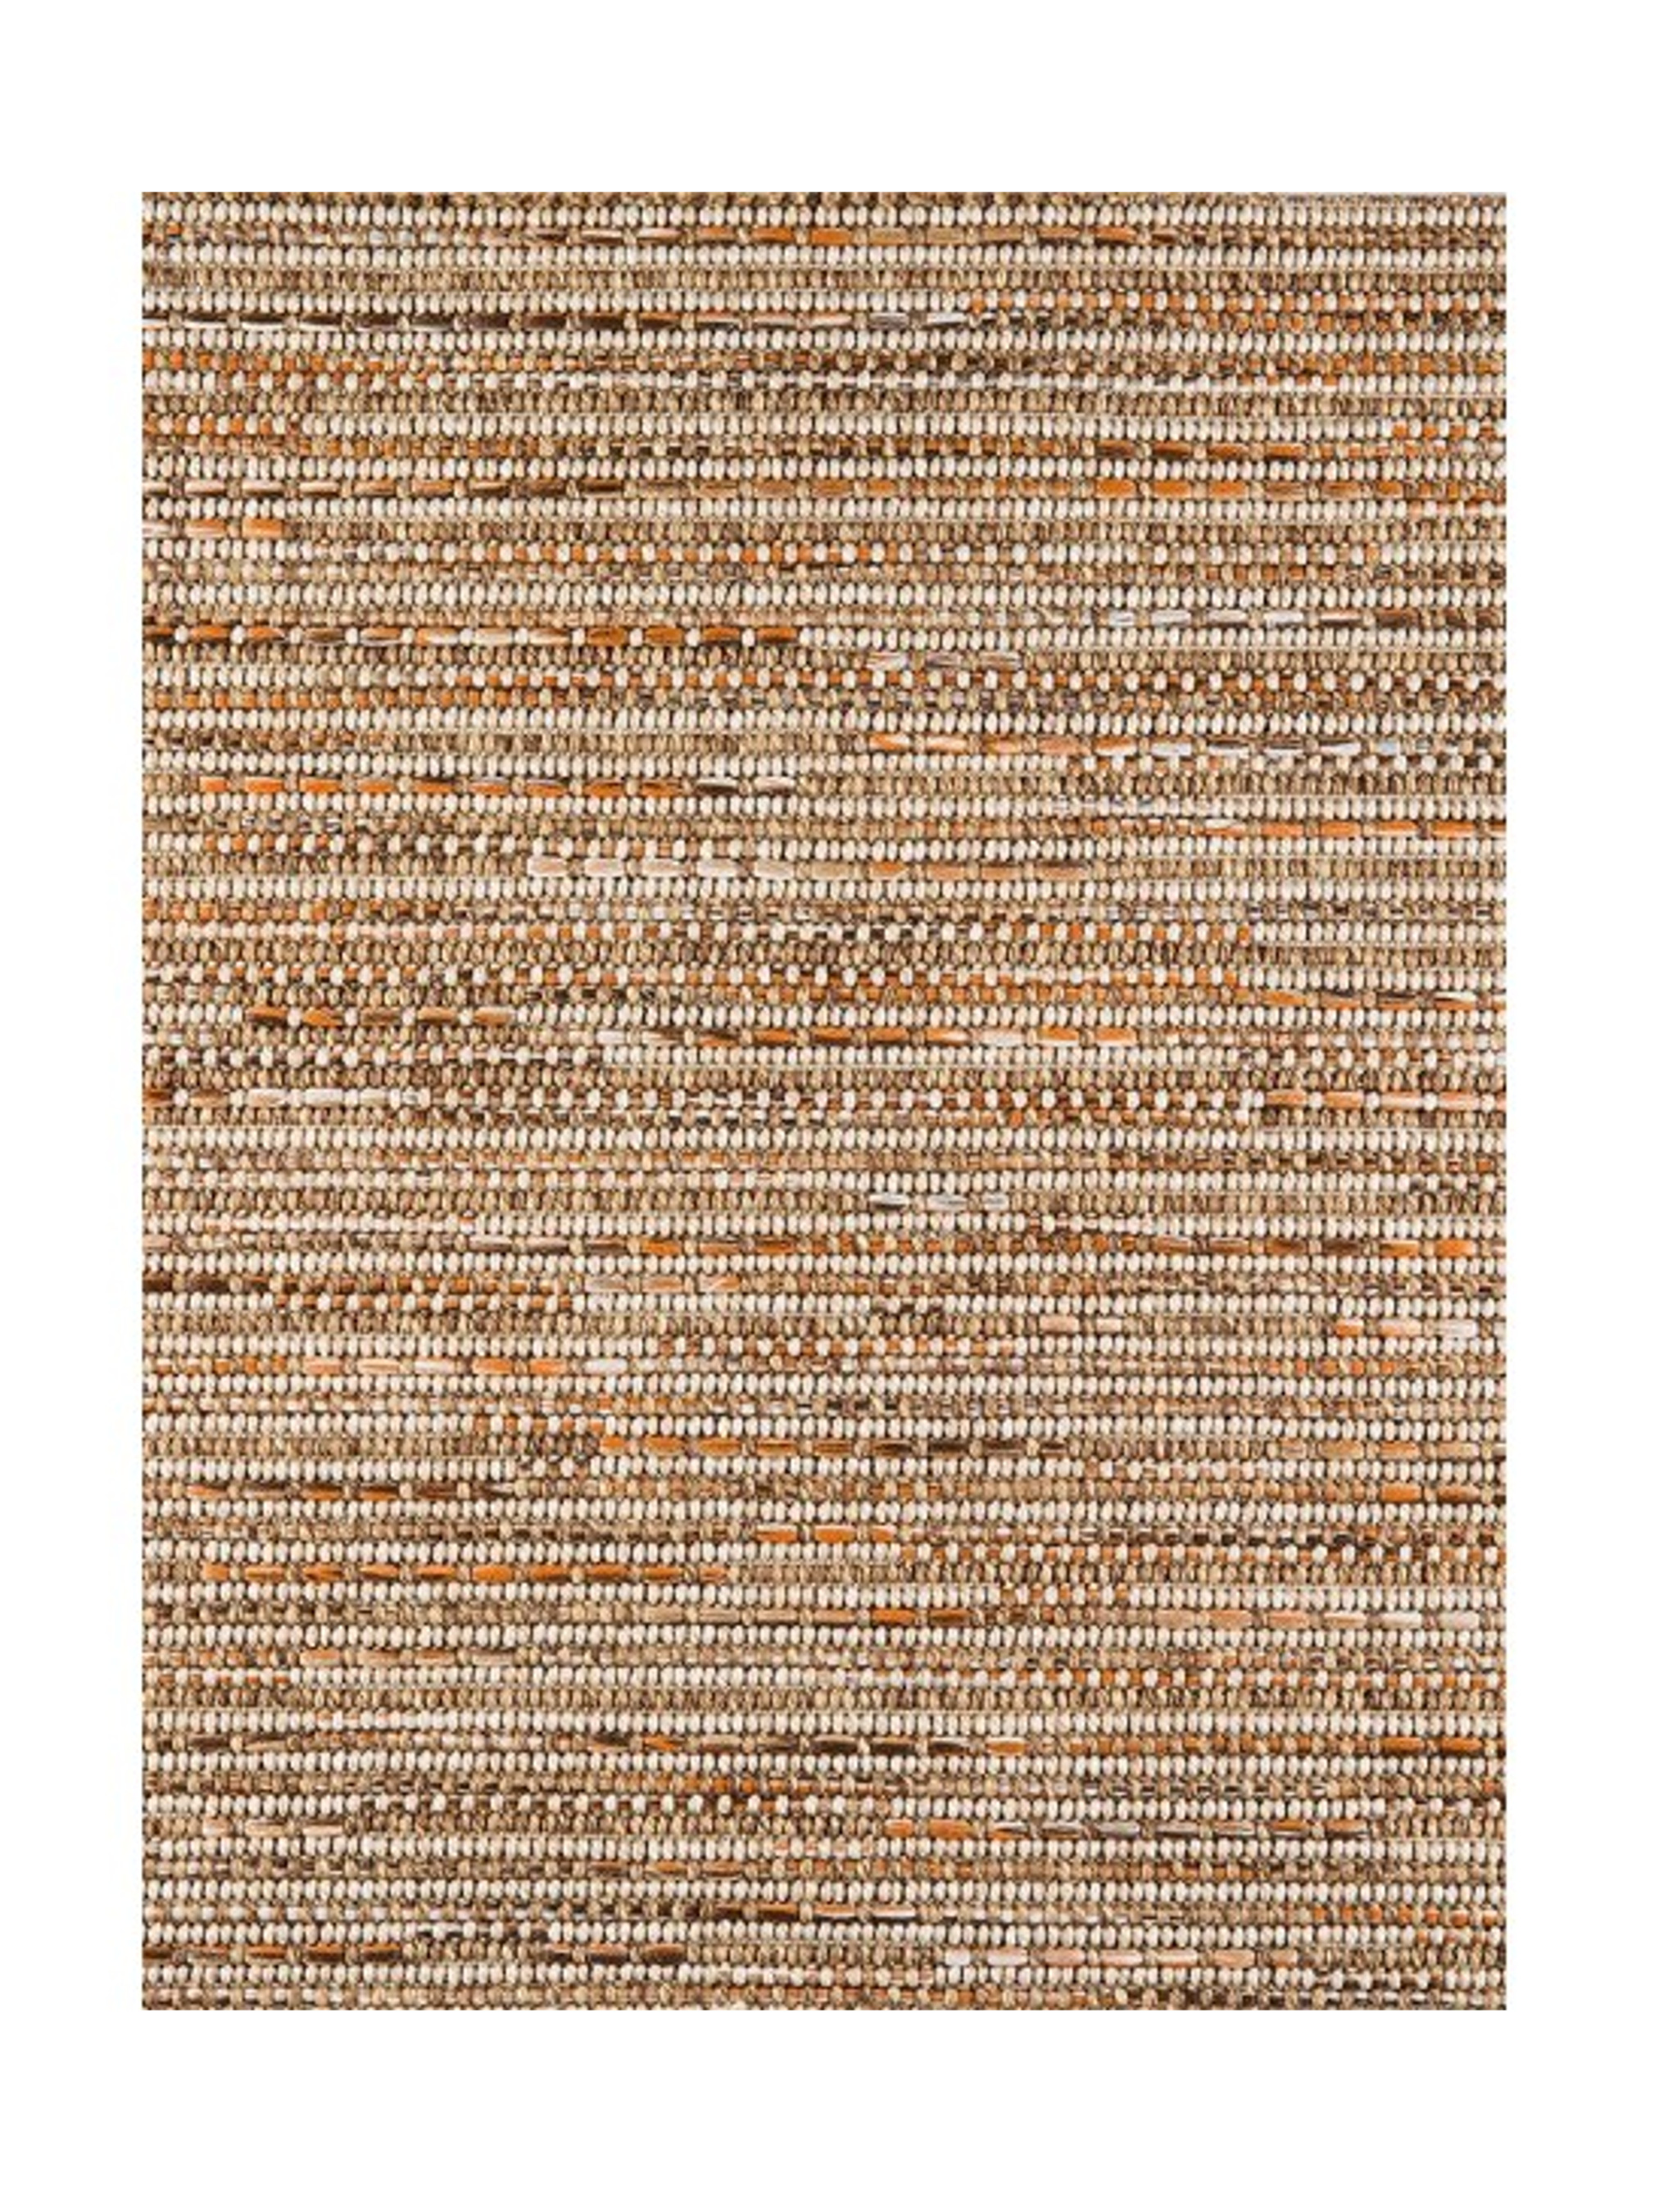 Natura 4001 alfombras interior exterior a medida for Alfombras sinteticas a medida